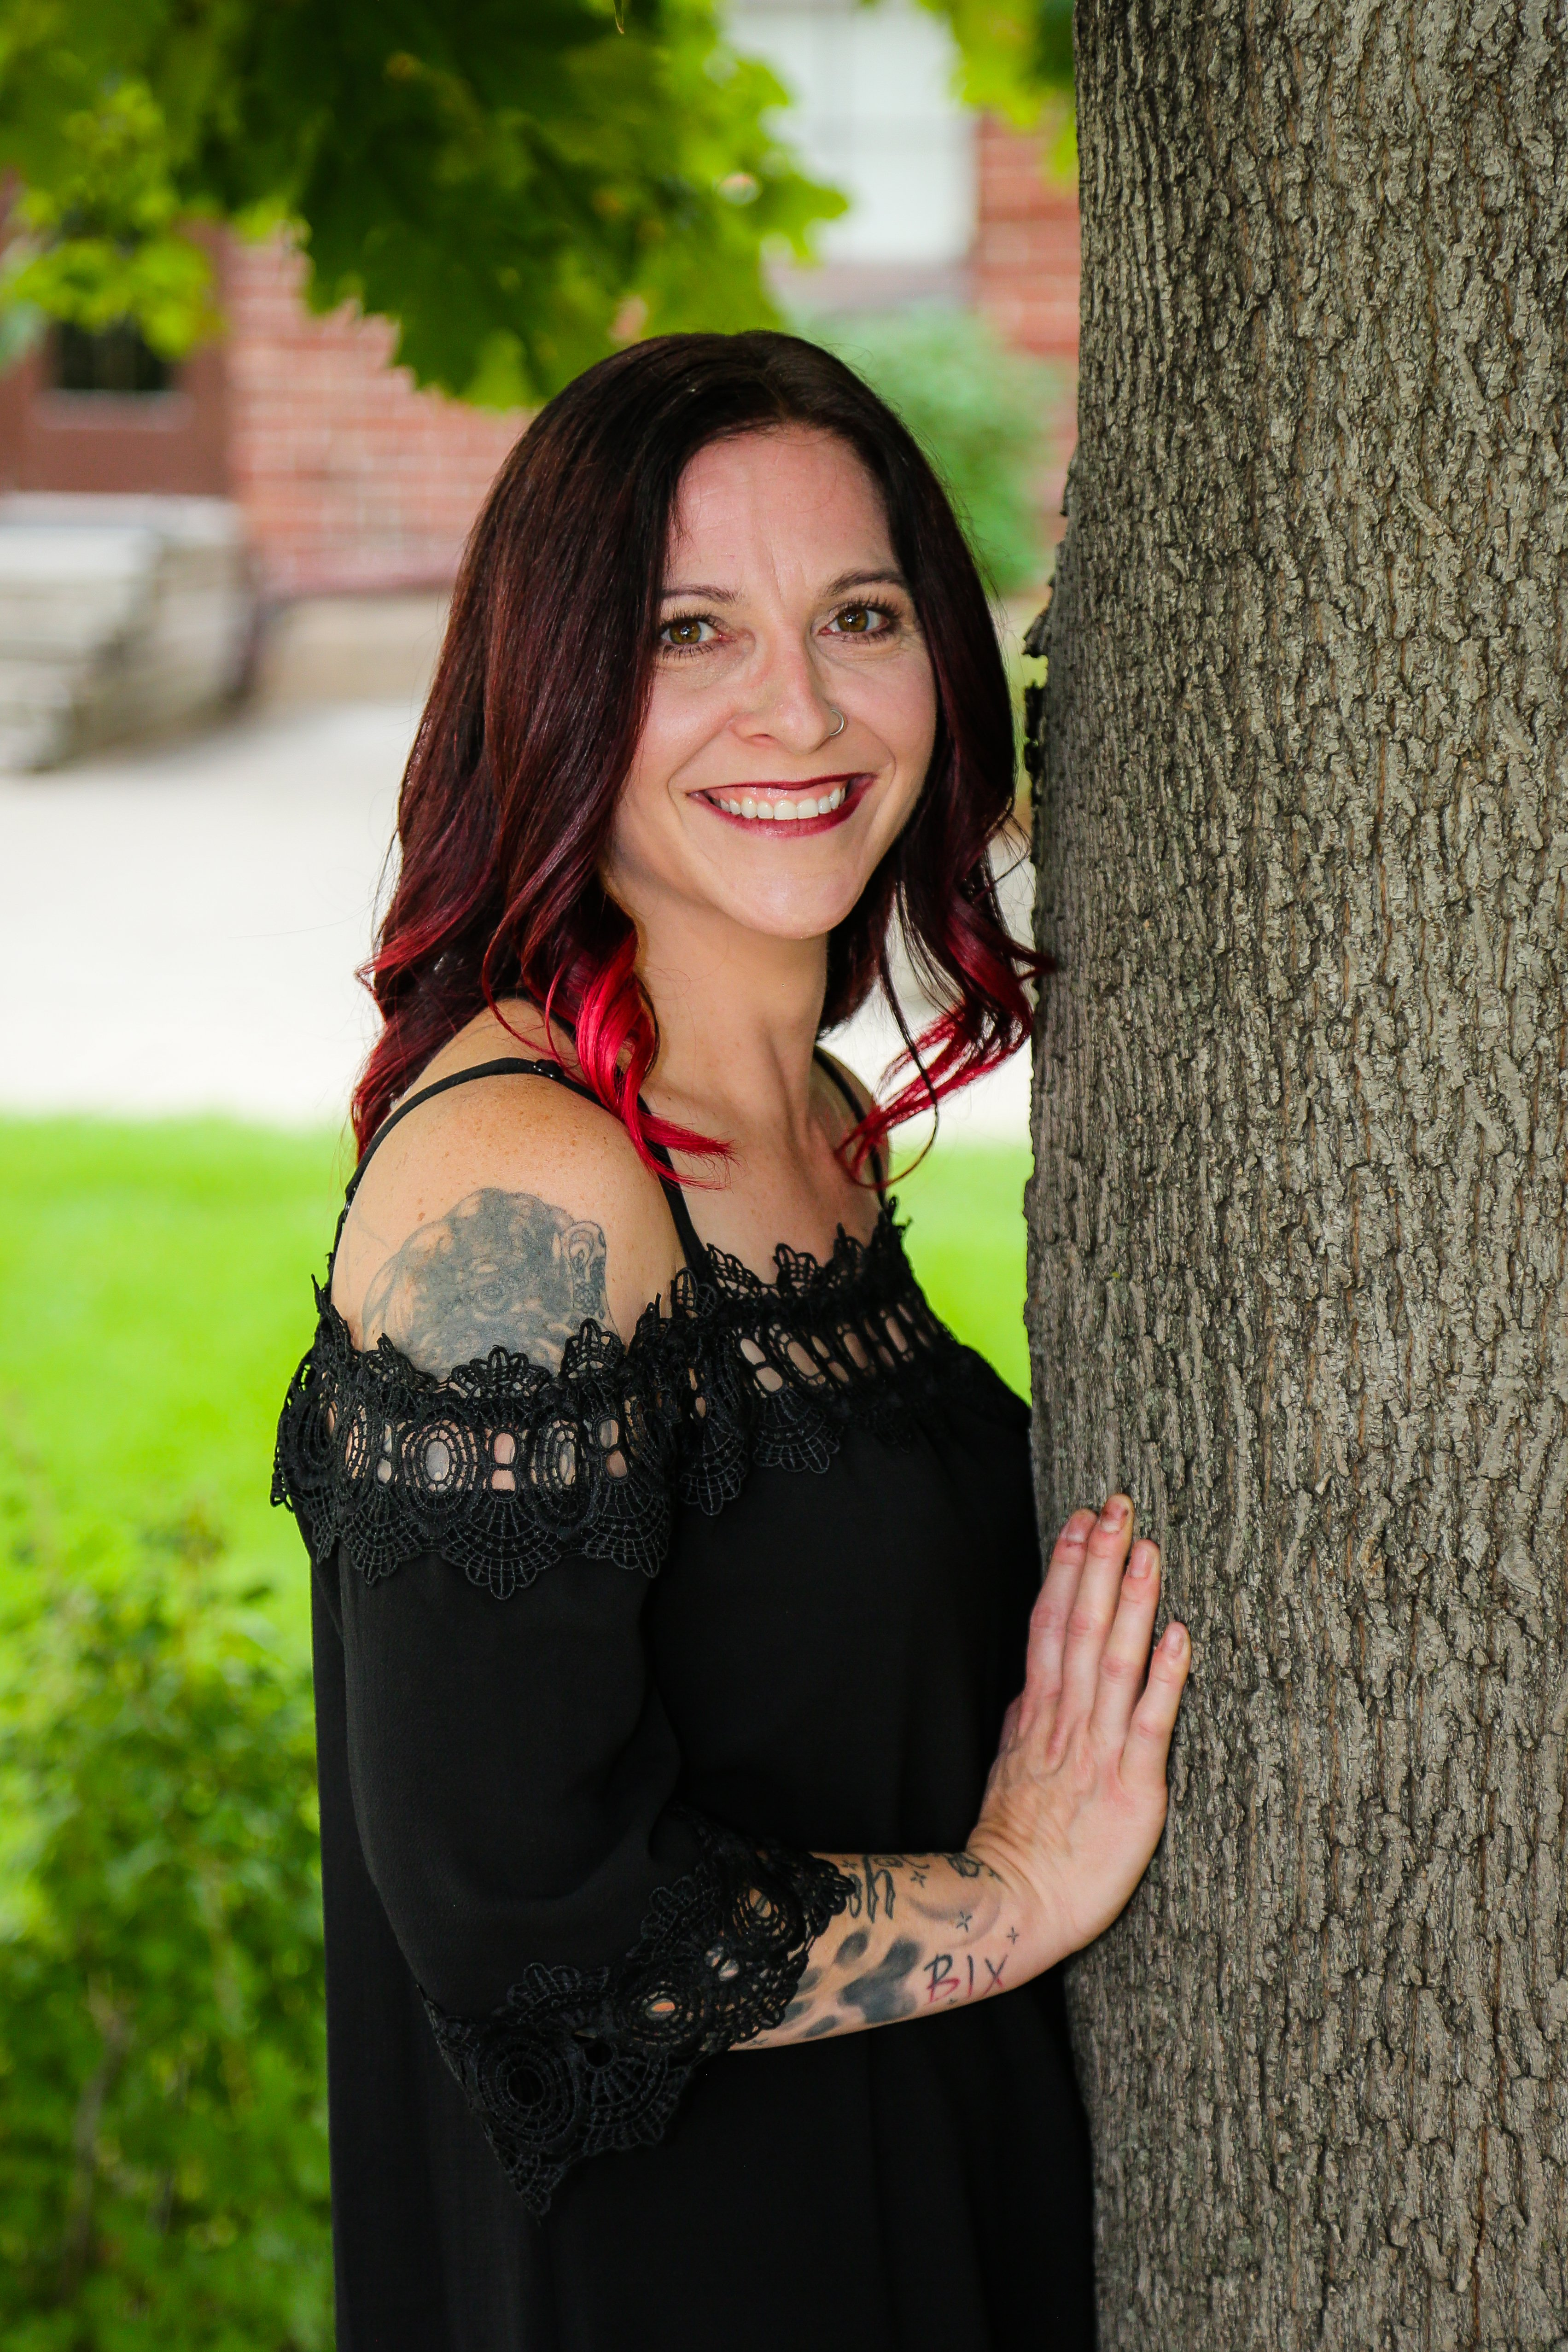 Jessica Hardie